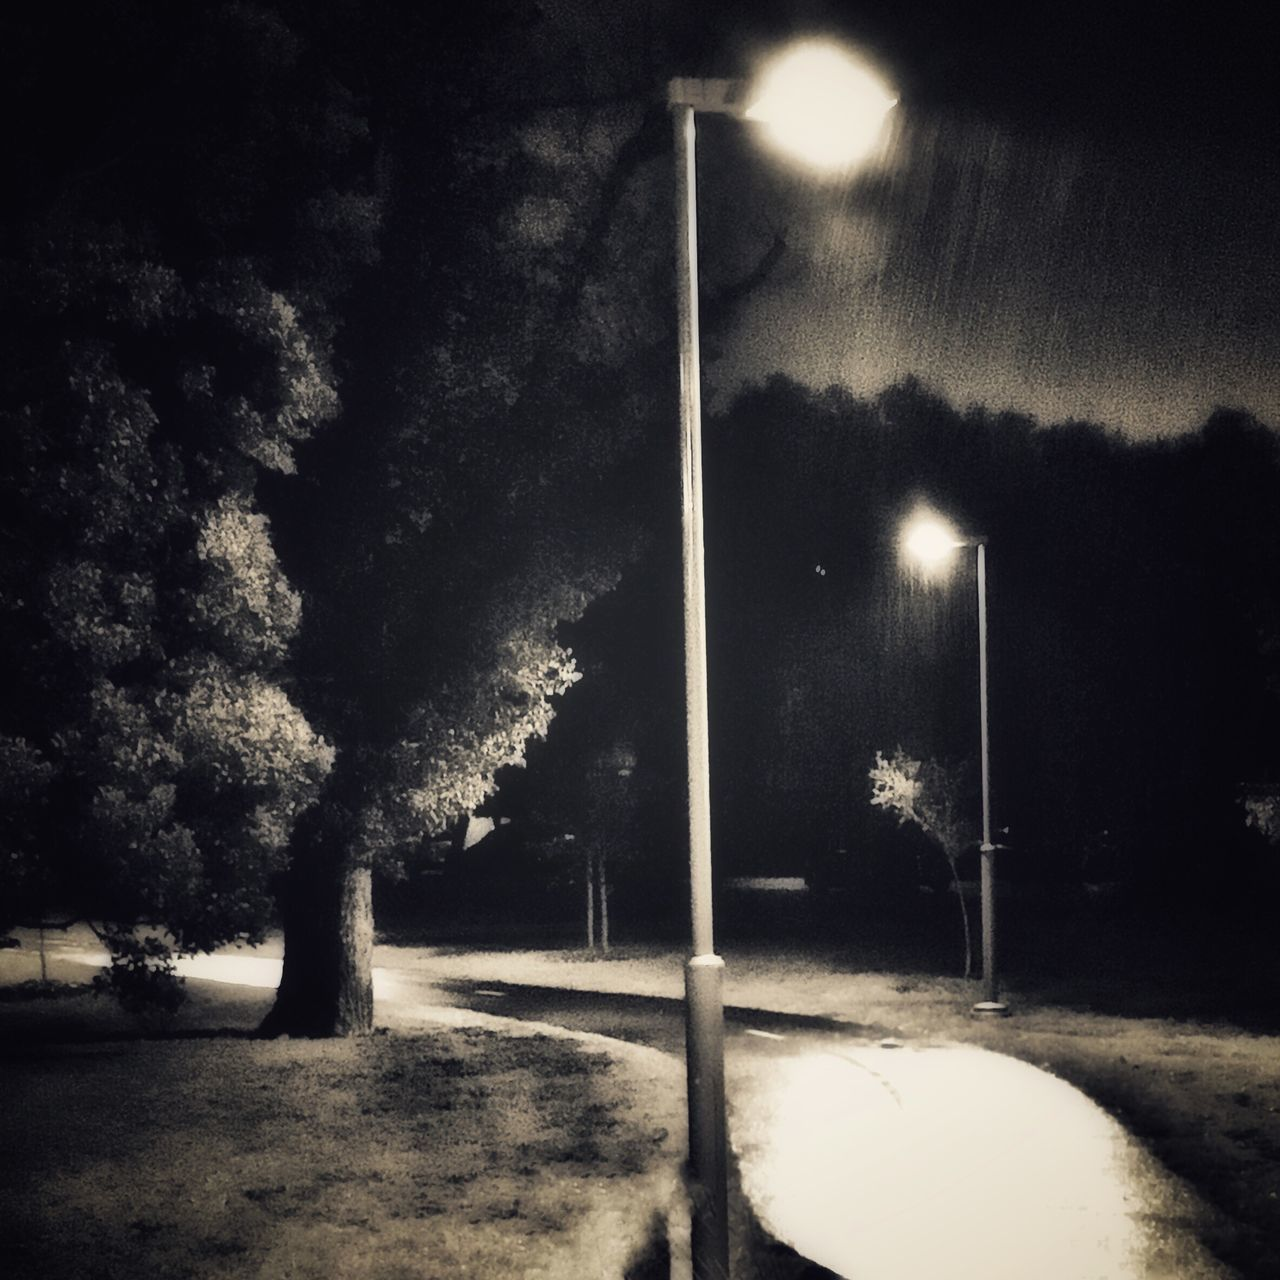 Dark Blackandwhite No People Tranquility Night Nightphotography Rain Bnw Melbourne Path Pathway Landscape Streetphoto_bw